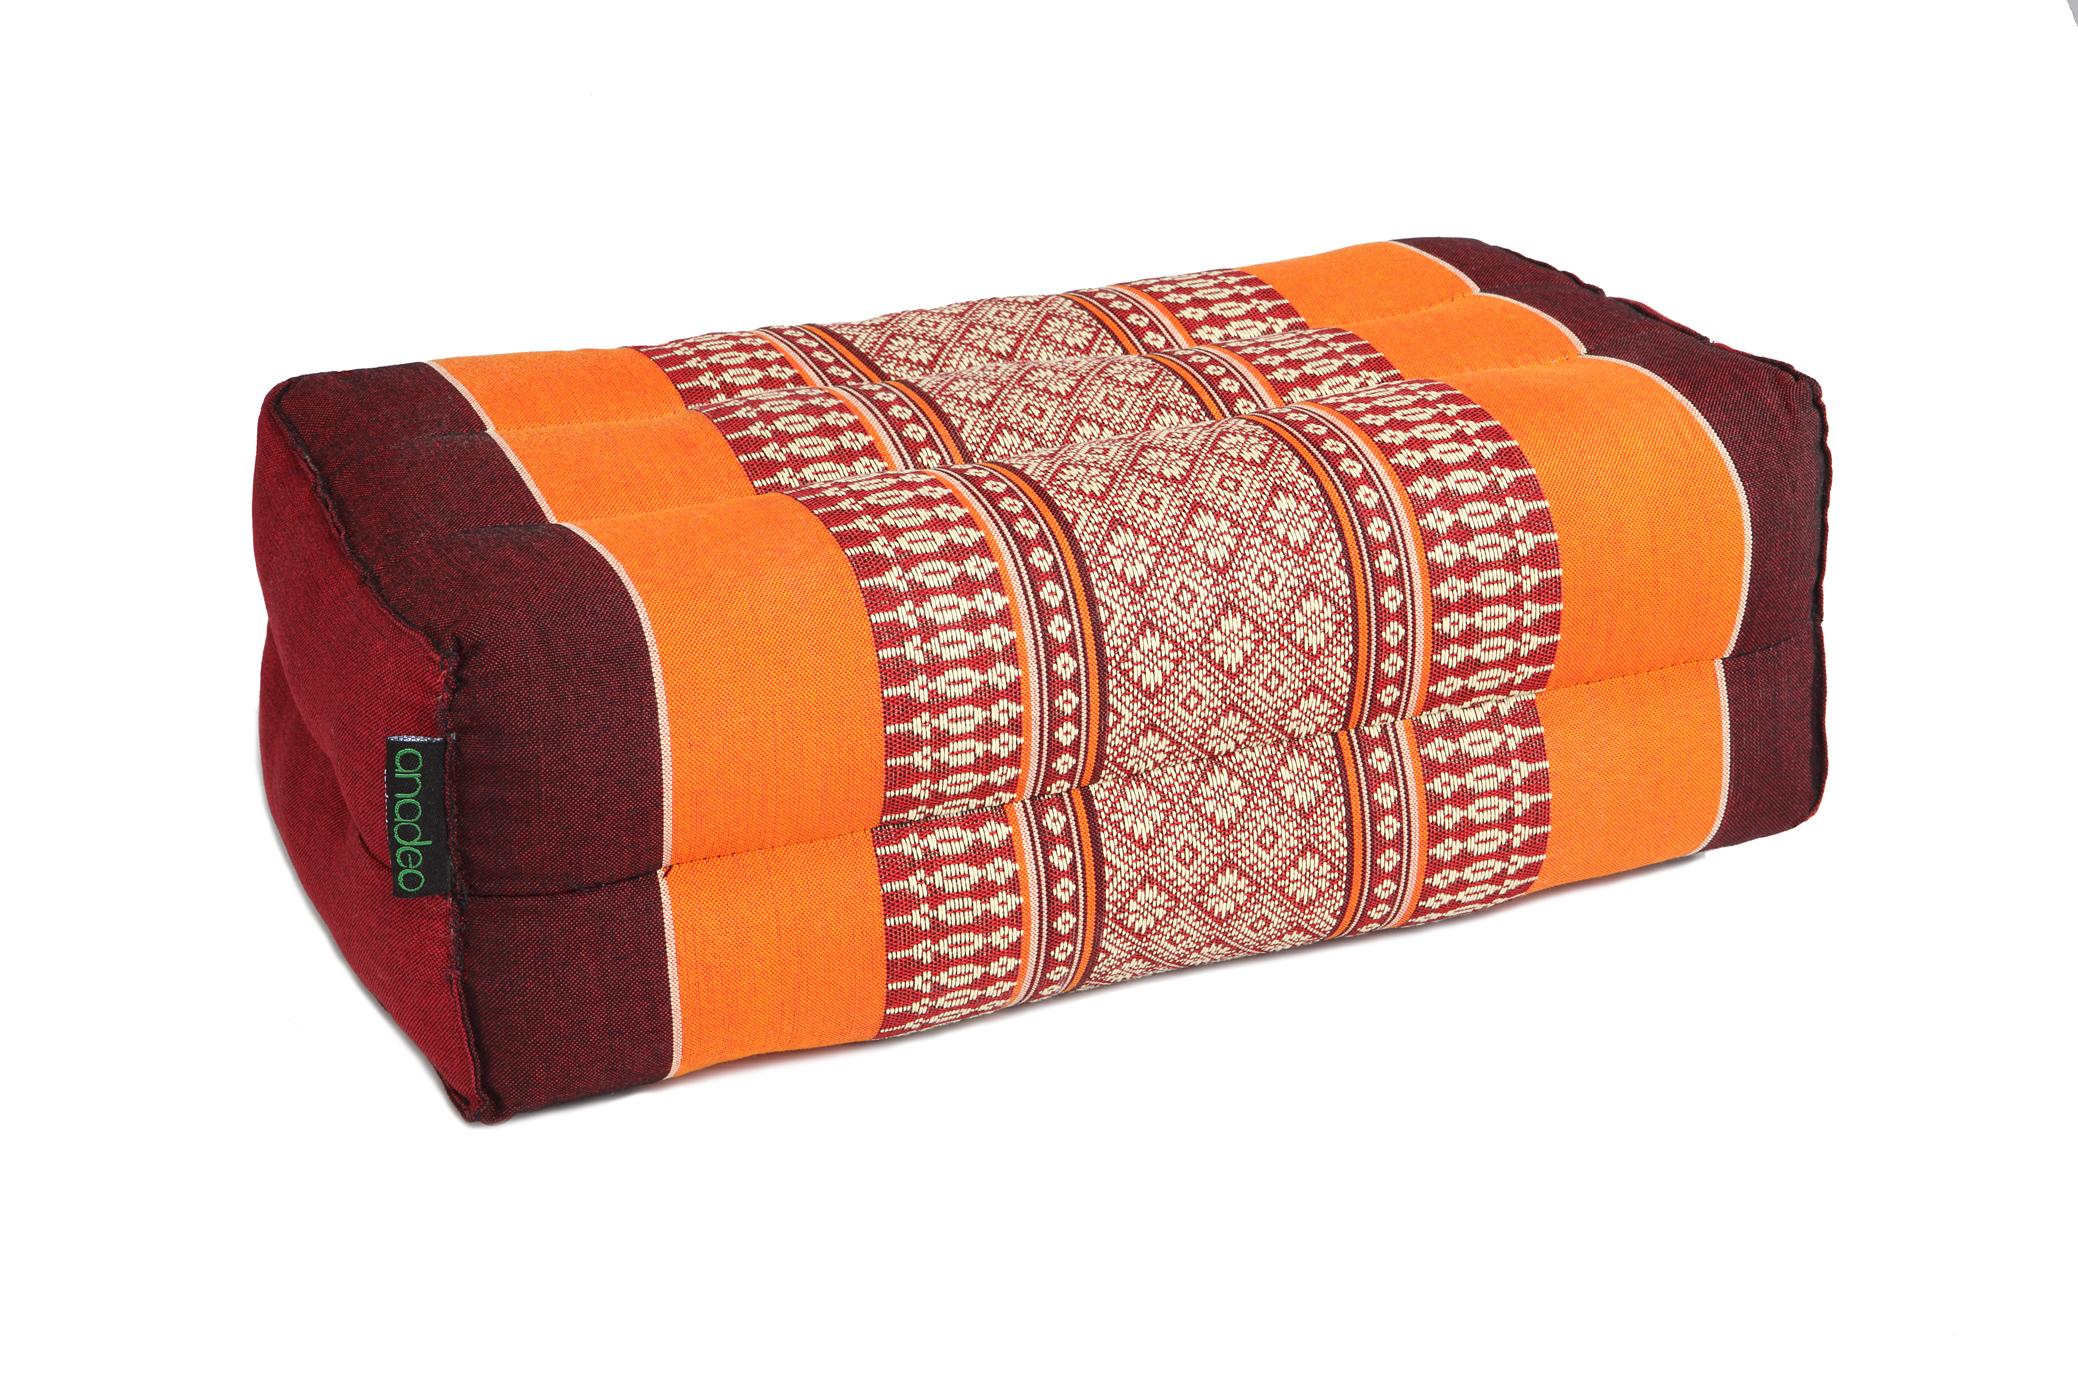 anadeo-standard-yogacushion-burgundy orange